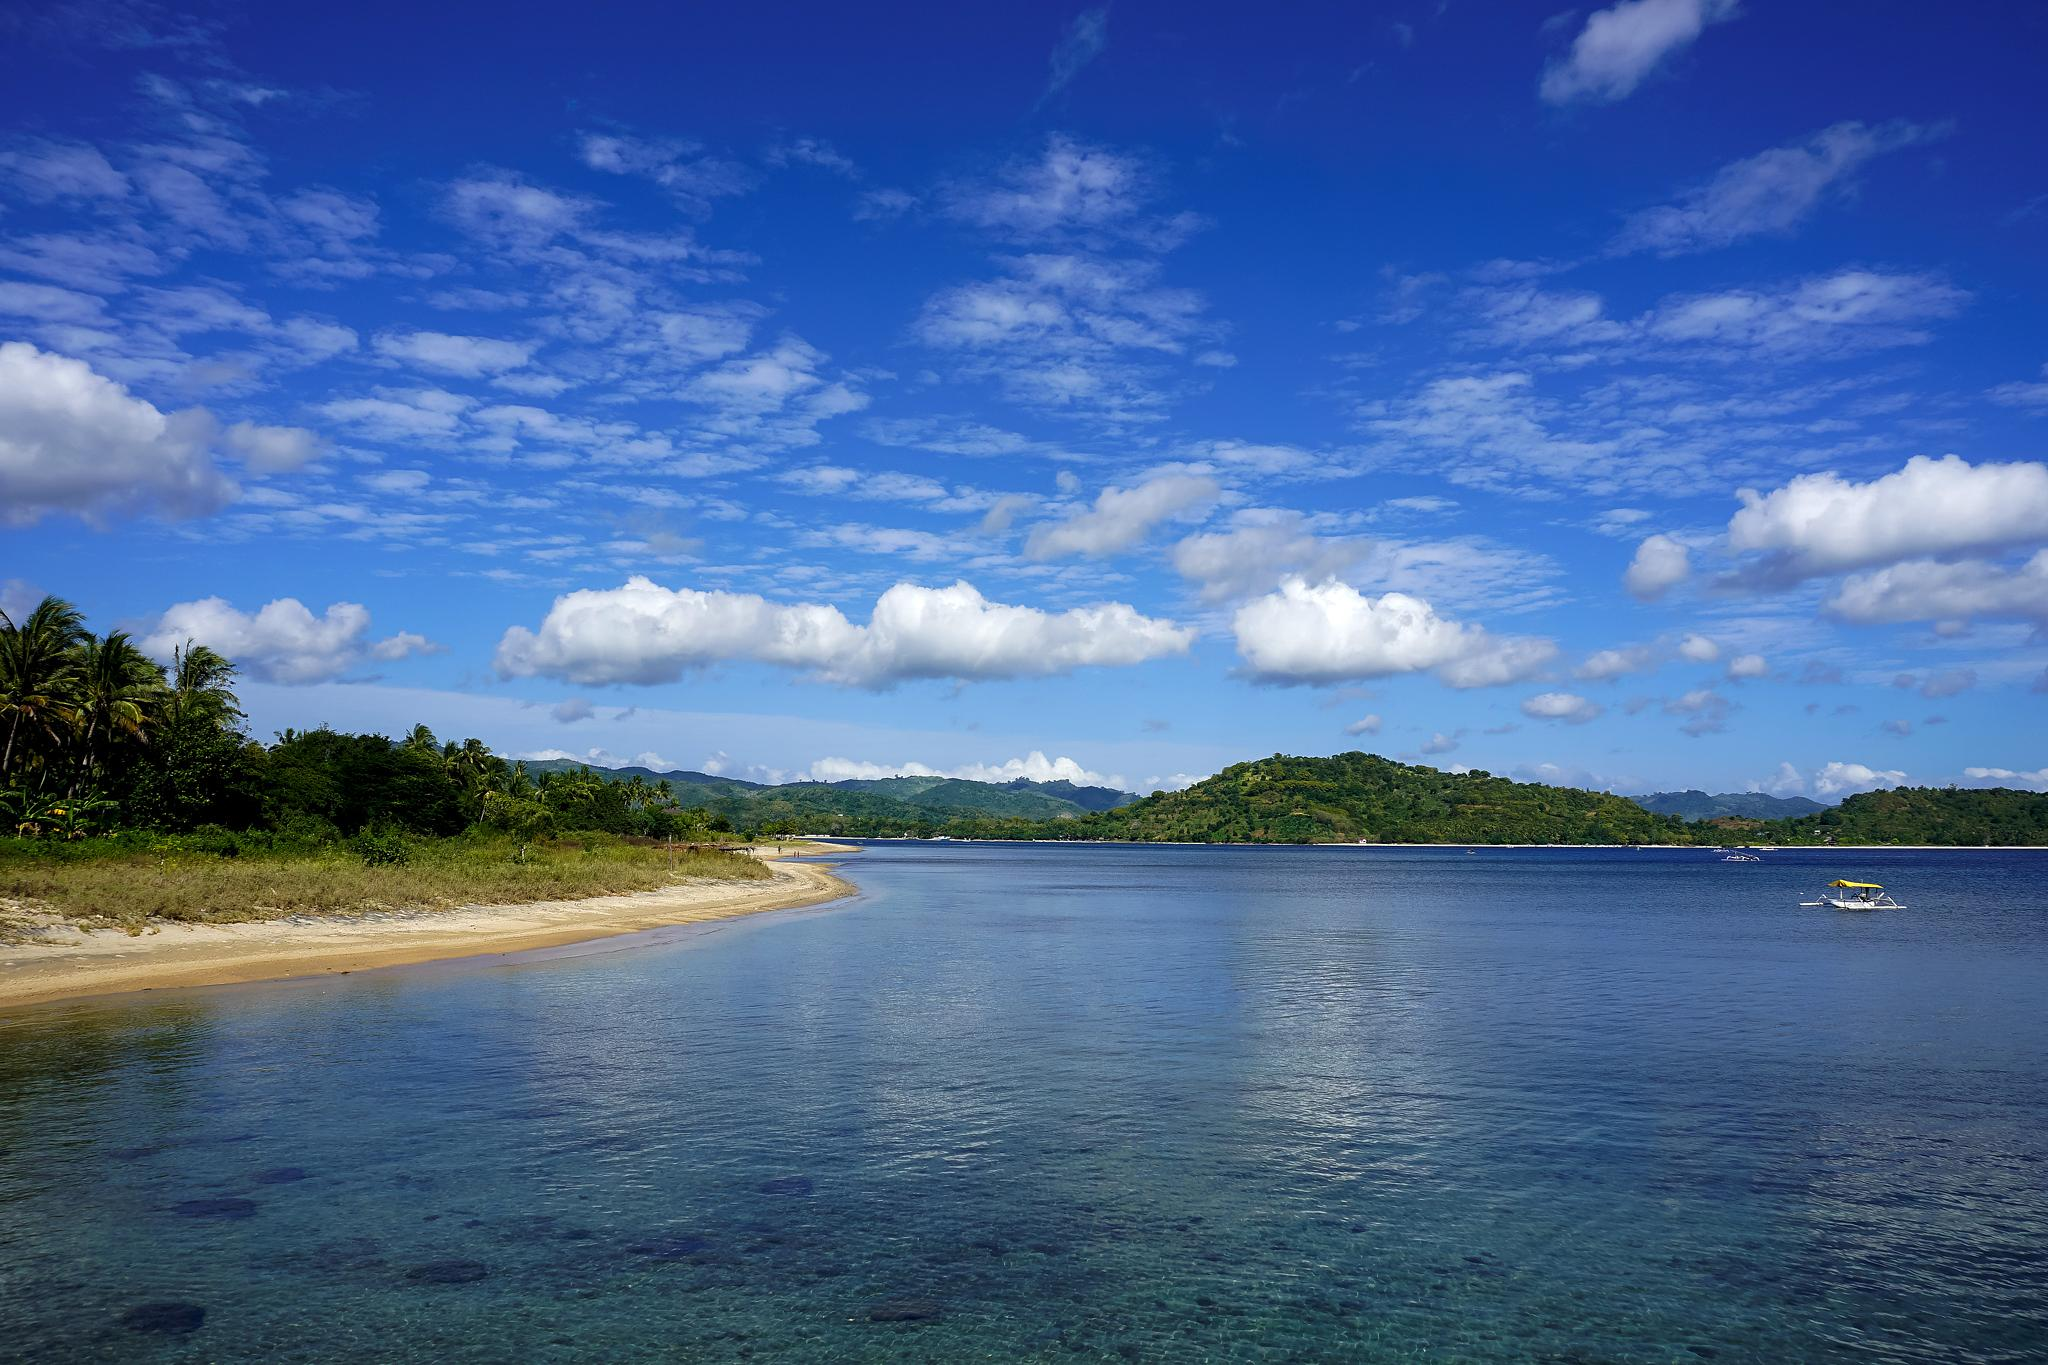 Sekotong Beach by Gema Dwi Saptono